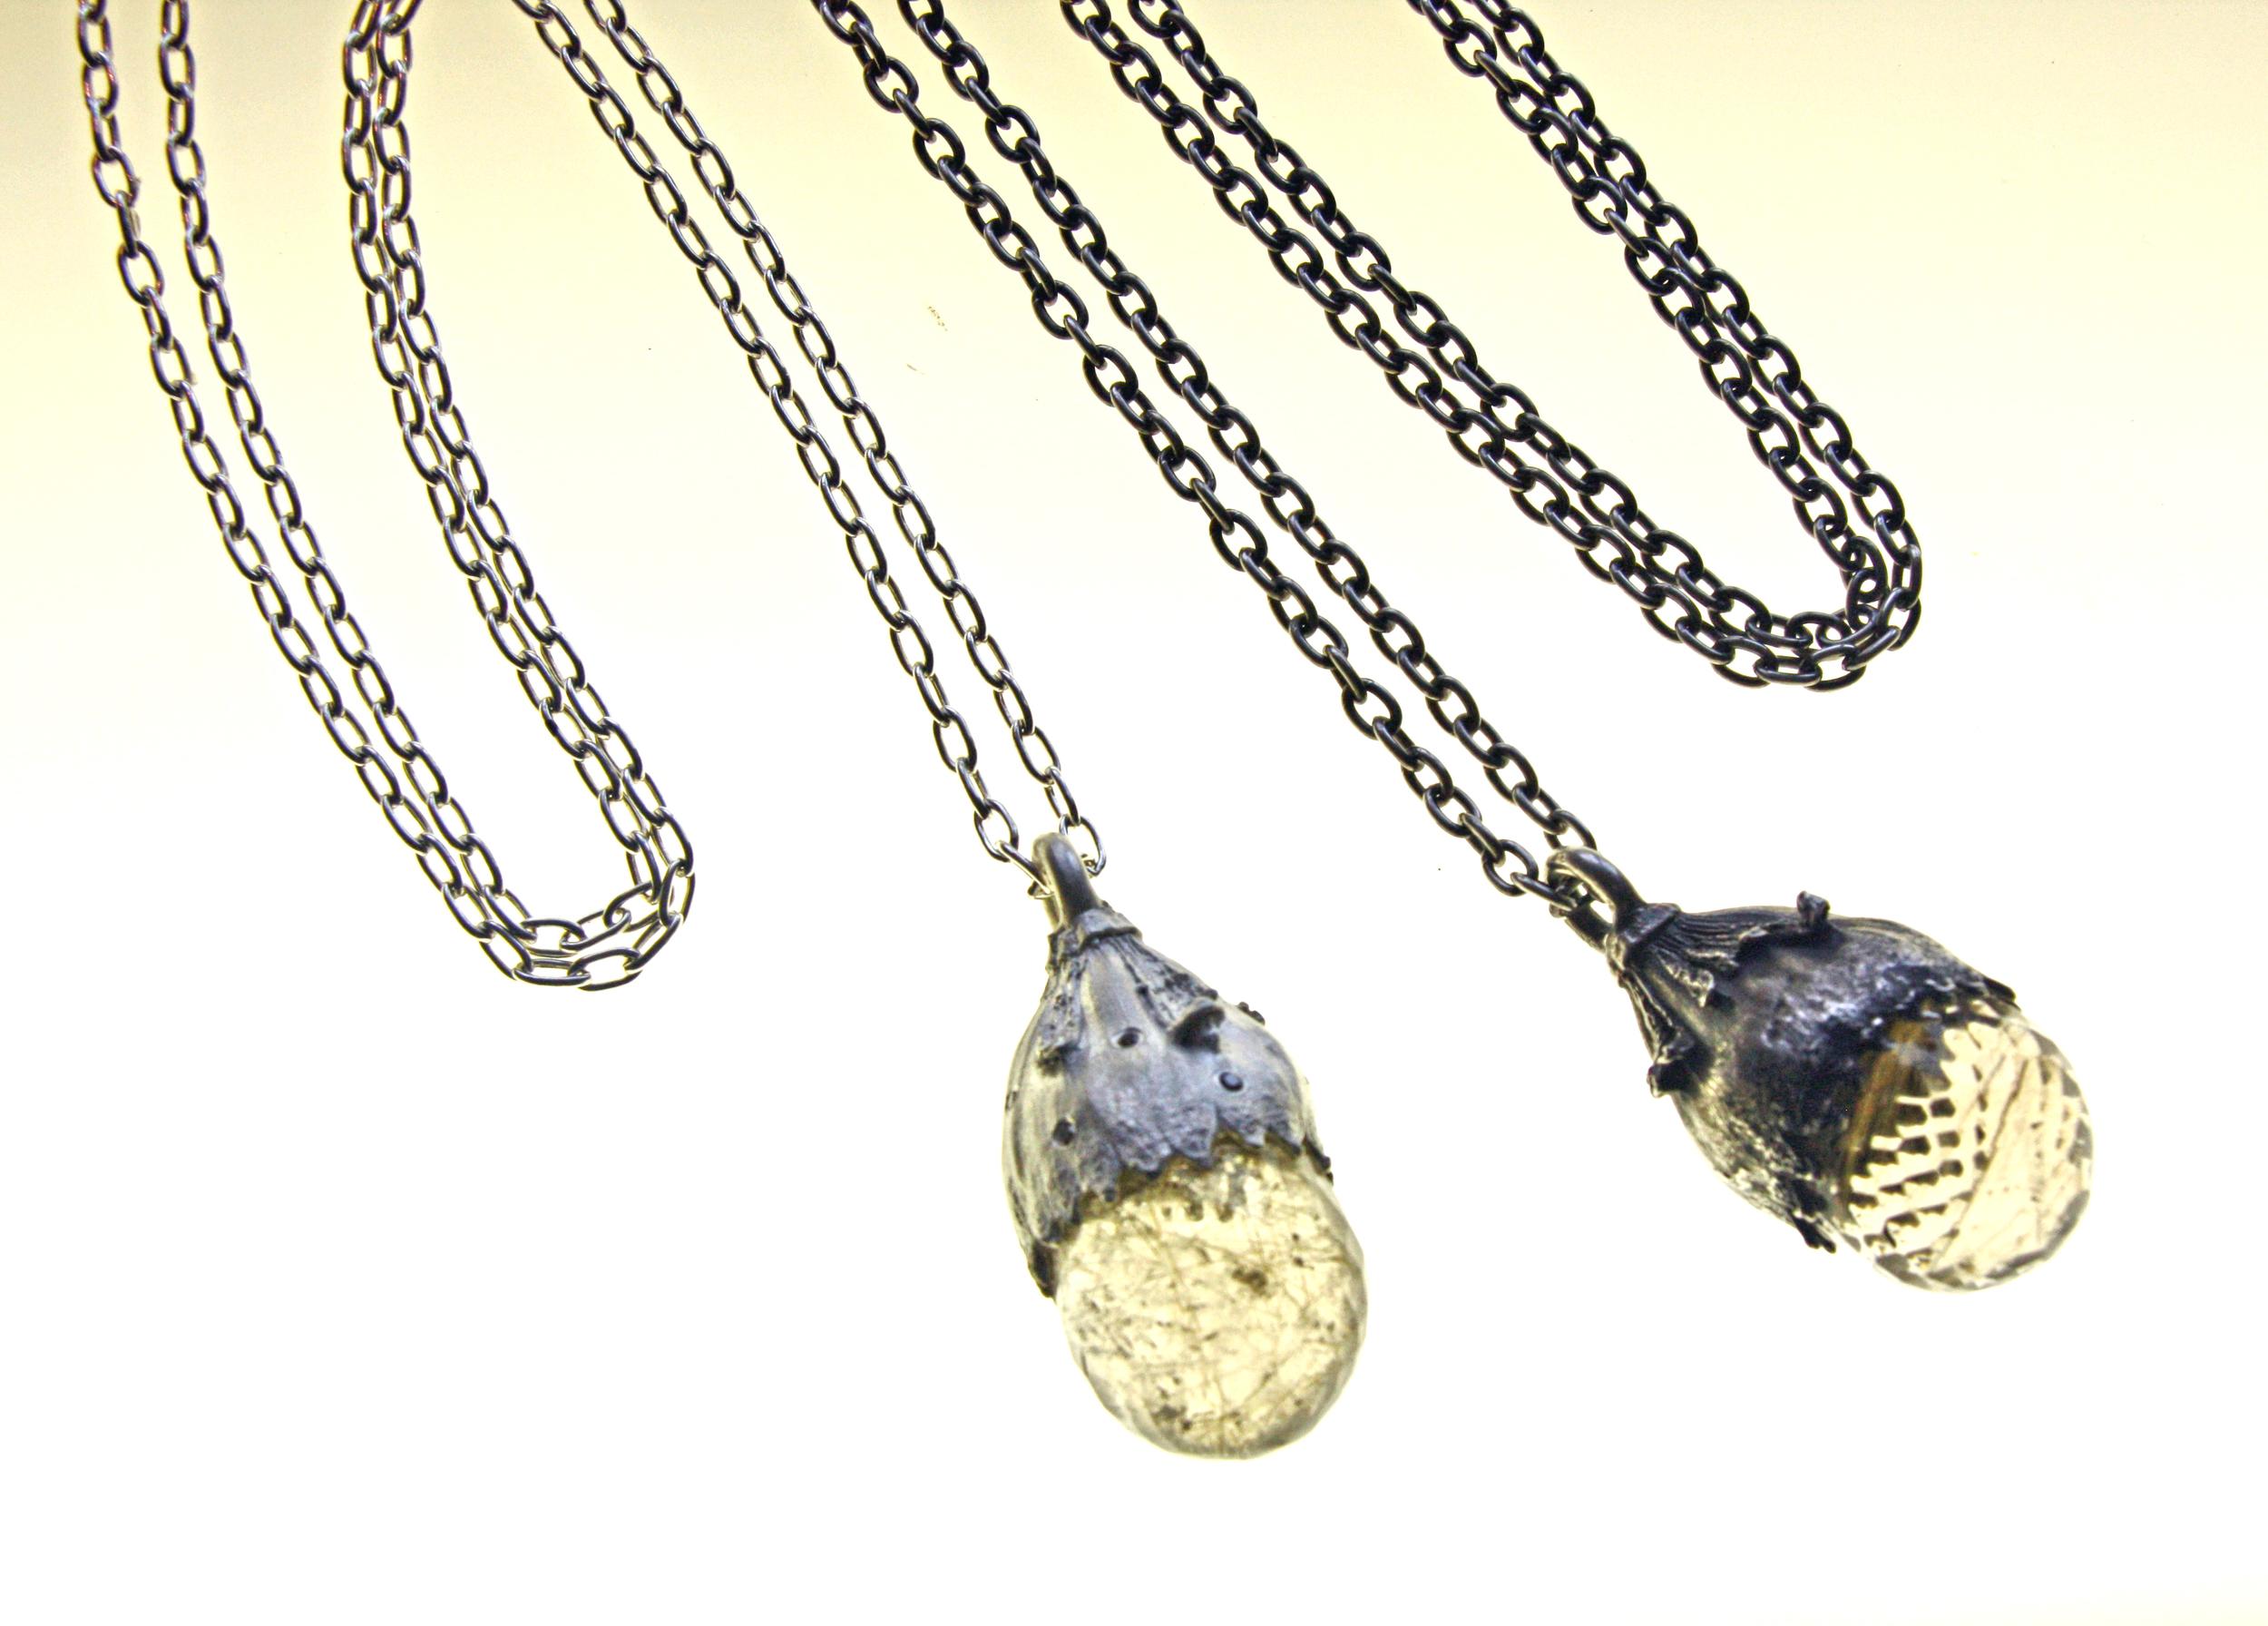 2 Acorns w chain croped (workon).jpg